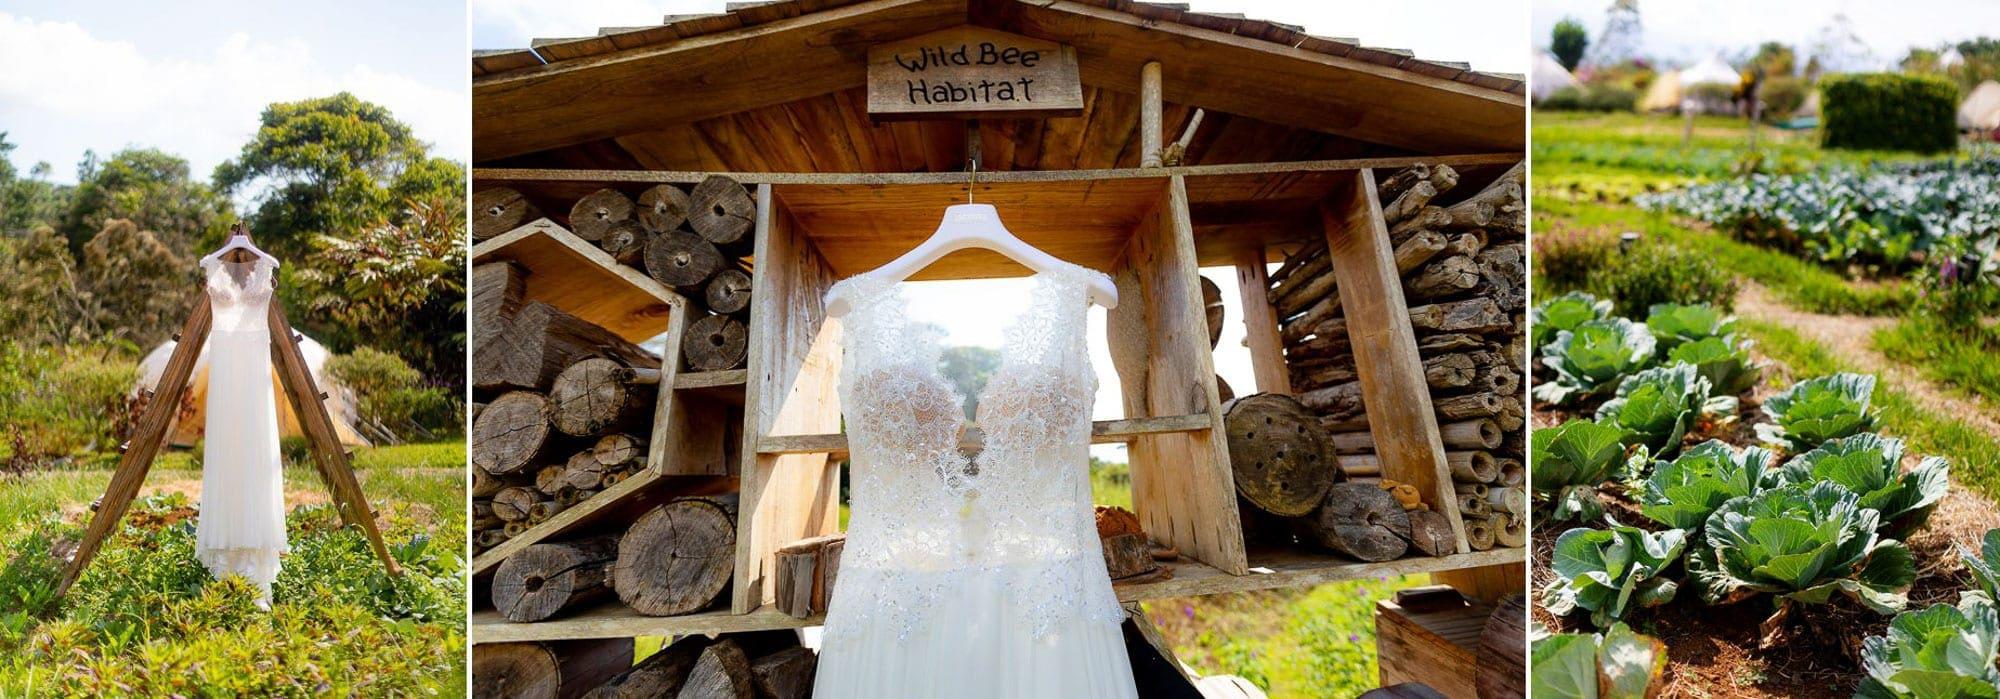 The dress on display